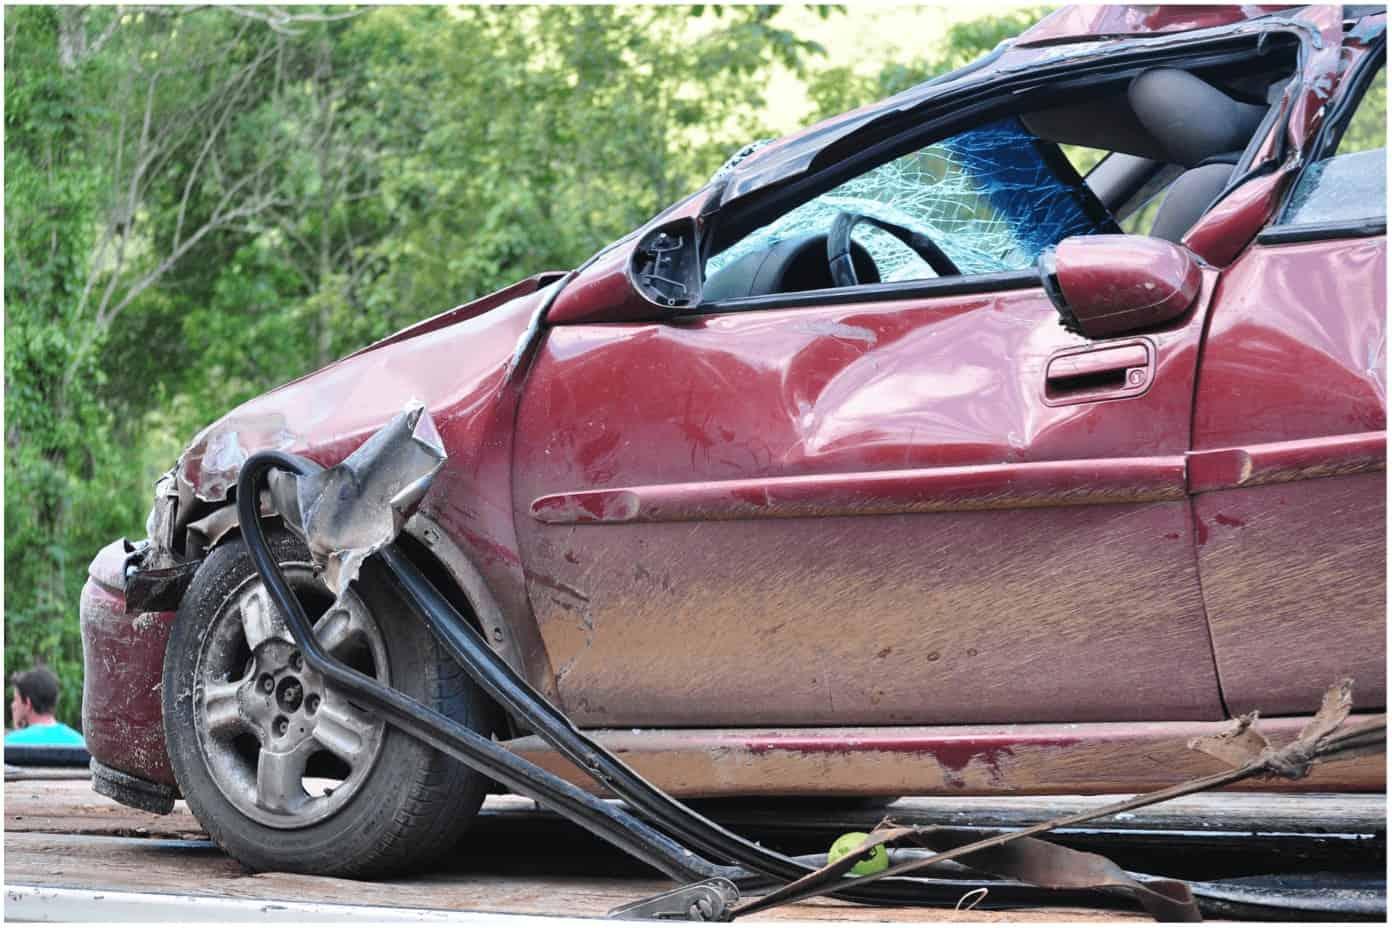 Mac Troubleshooting Guide Car crash